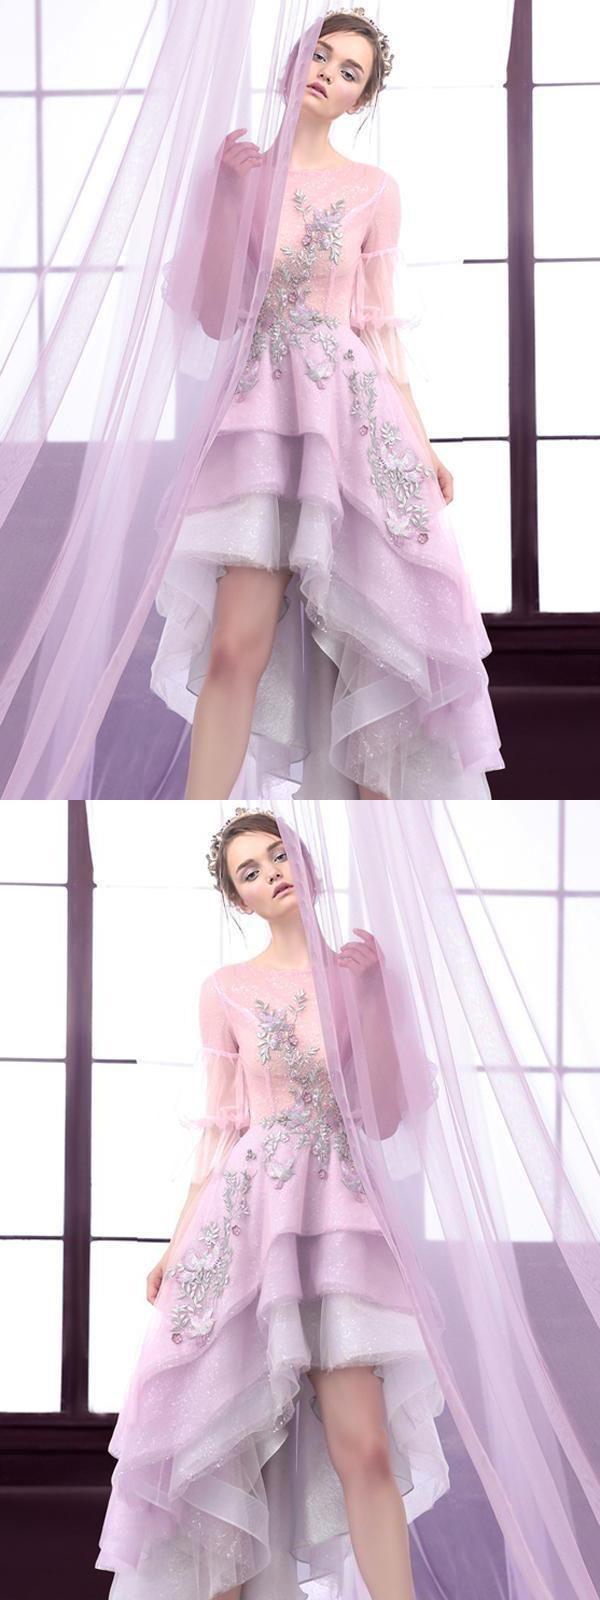 Appealing prom dresses lace aline prom dresses long prom dresses